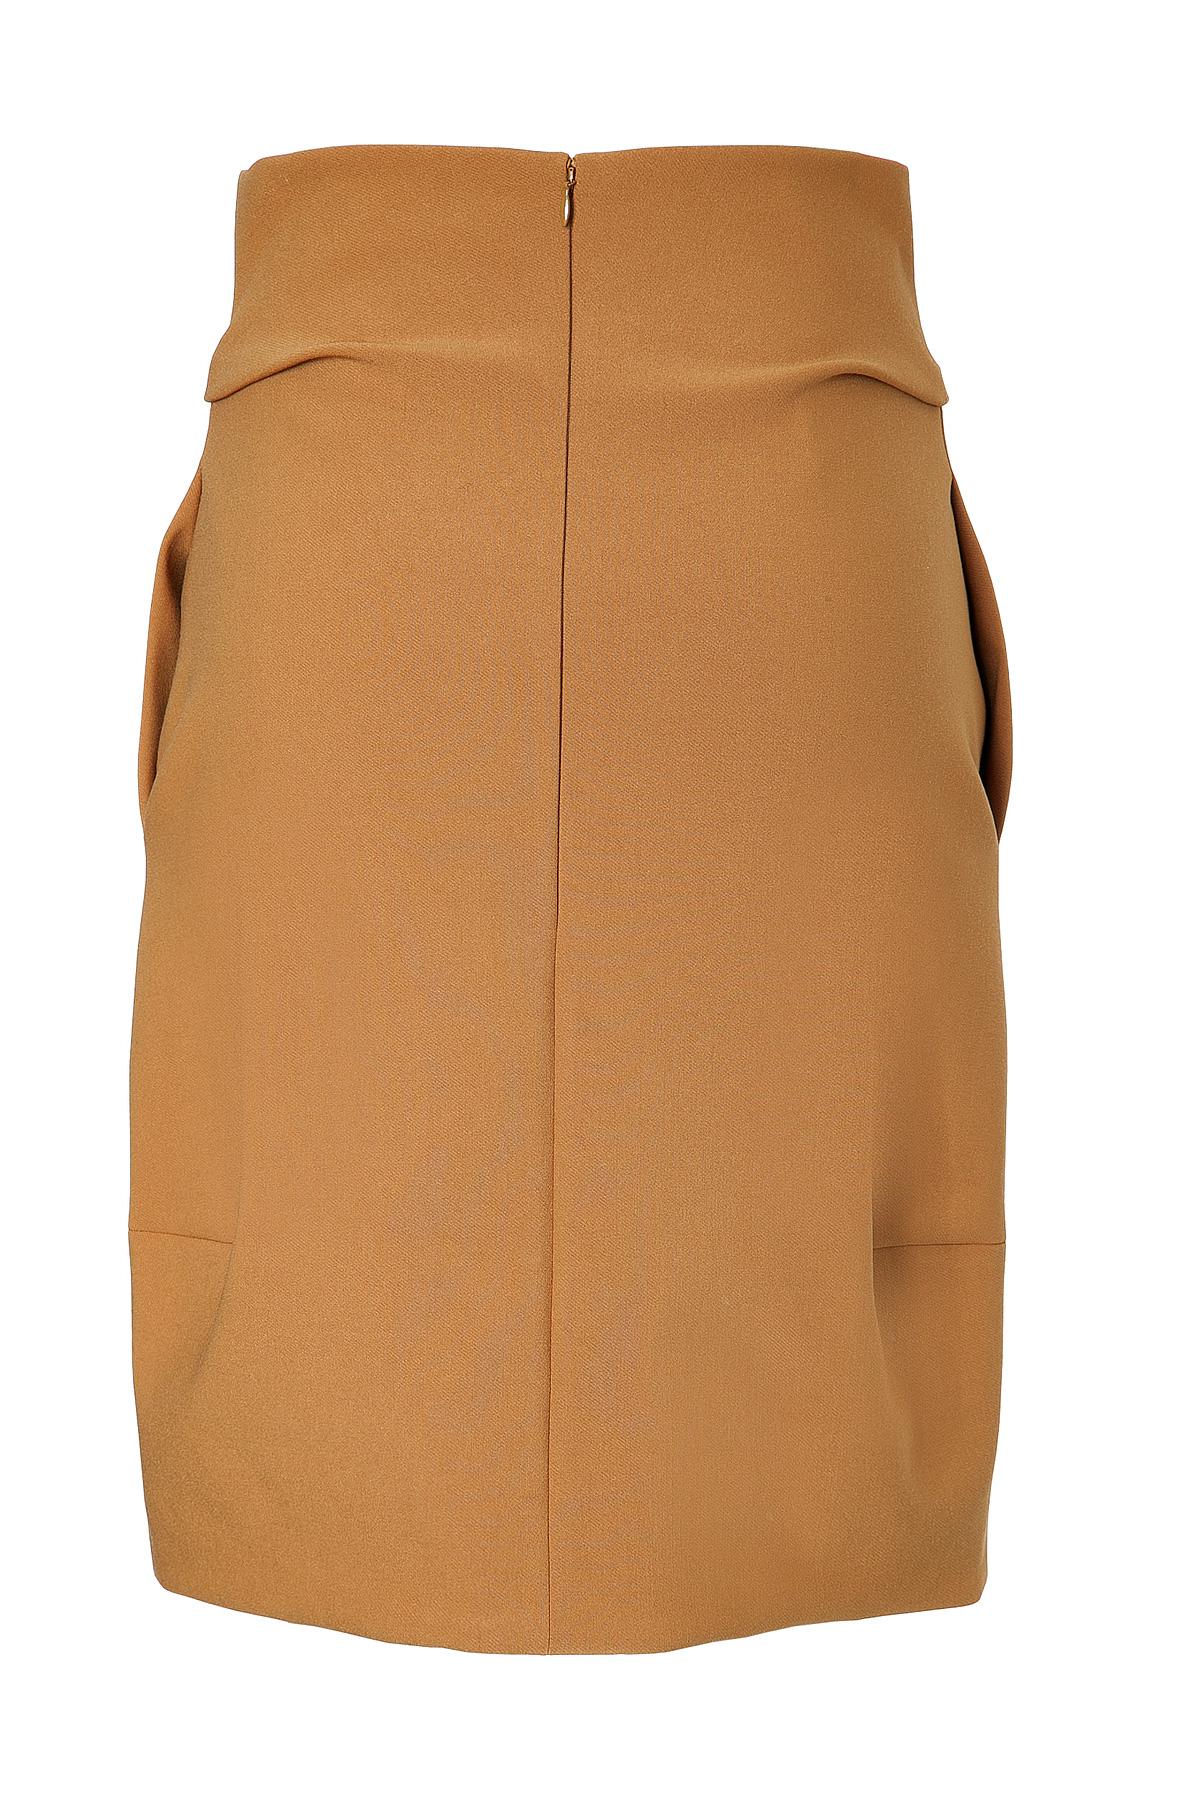 jil sander wool saetta pencil skirt camel in brown lyst